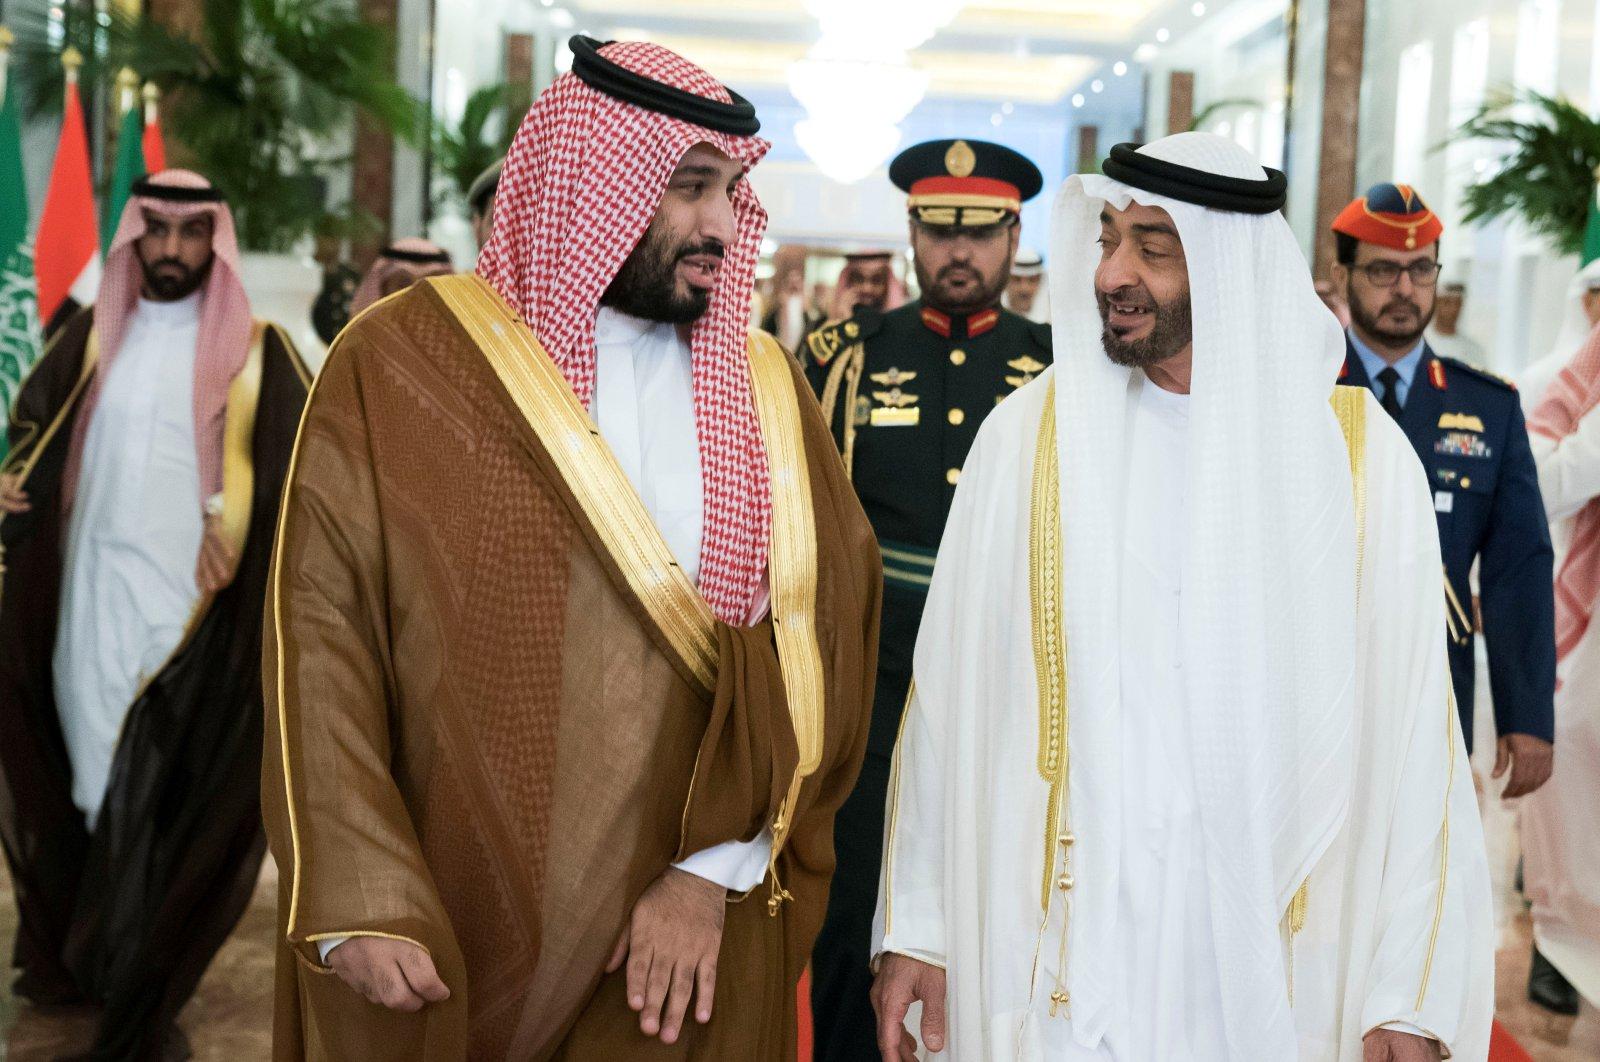 Abu Dhabi Crown Prince Sheikh Mohammed bin Zayed Al Nahyan receives Saudi Crown Prince Mohammed bin Salman at the Presidential Airport in Abu Dhabi, United Arab Emirates, Nov. 27, 2019. (Reuters Photo)